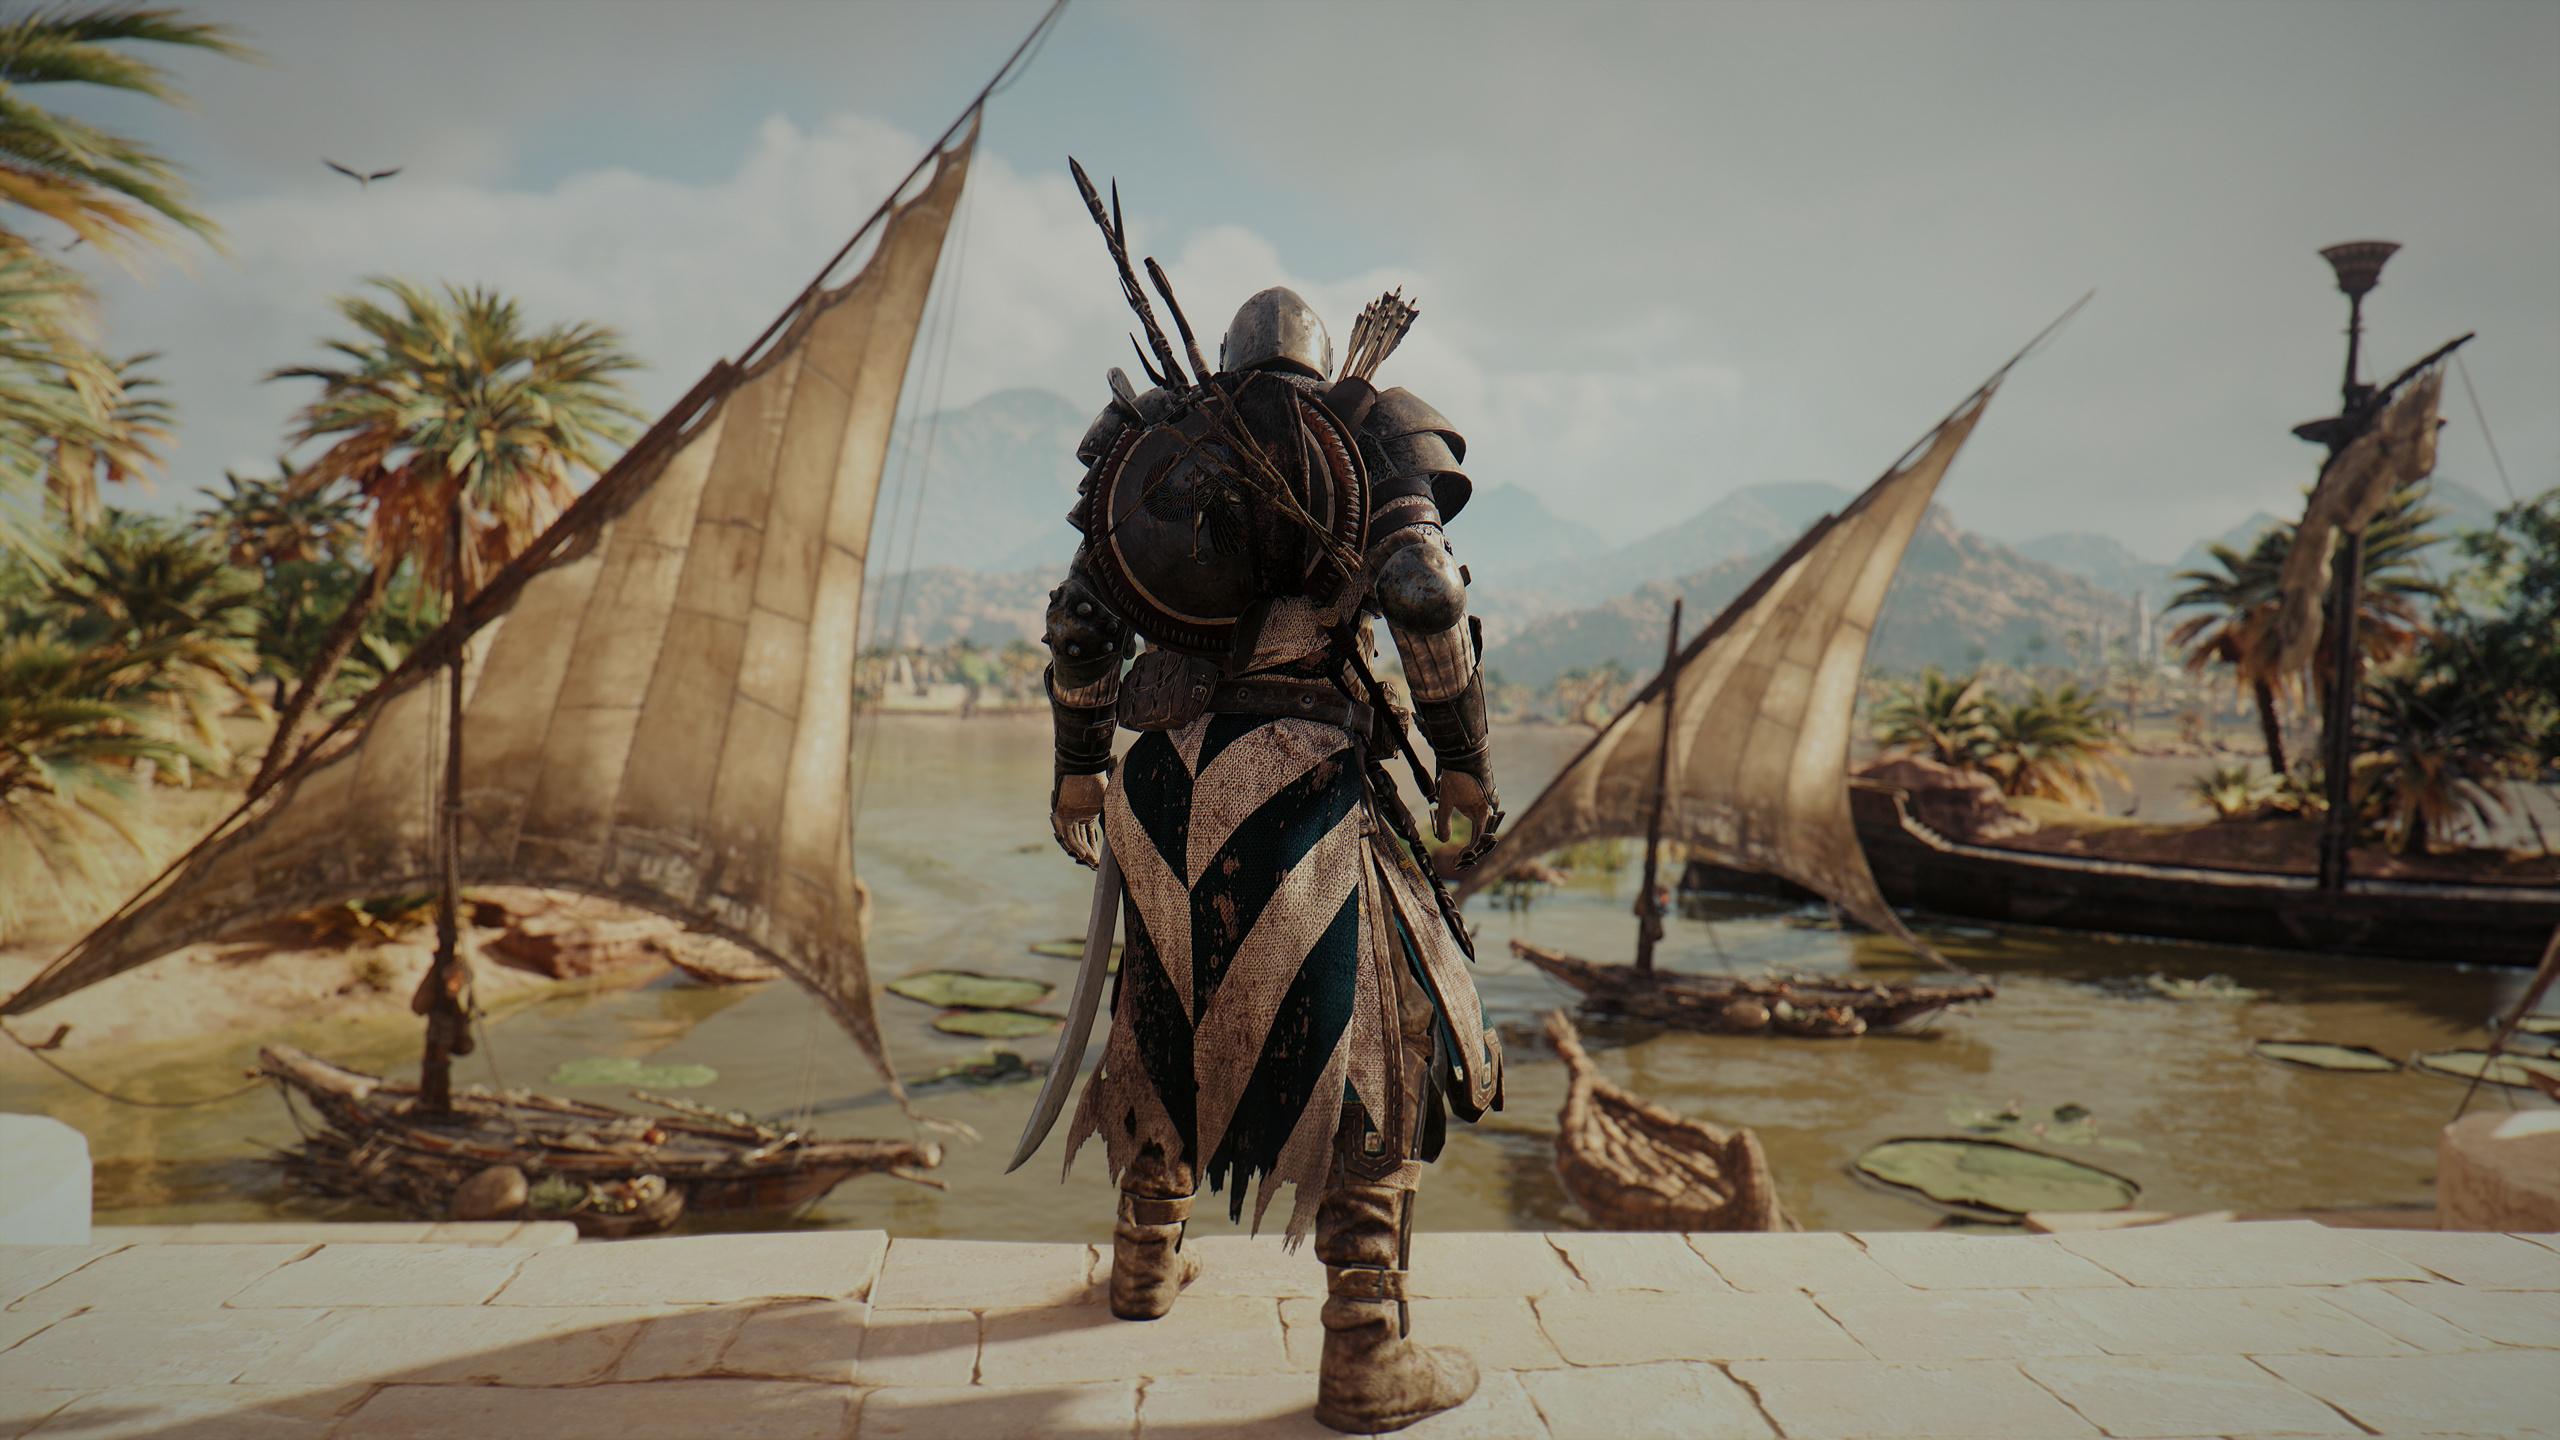 Download 2560x1440 Wallpaper Assassin S Creed Origins Bayek Of